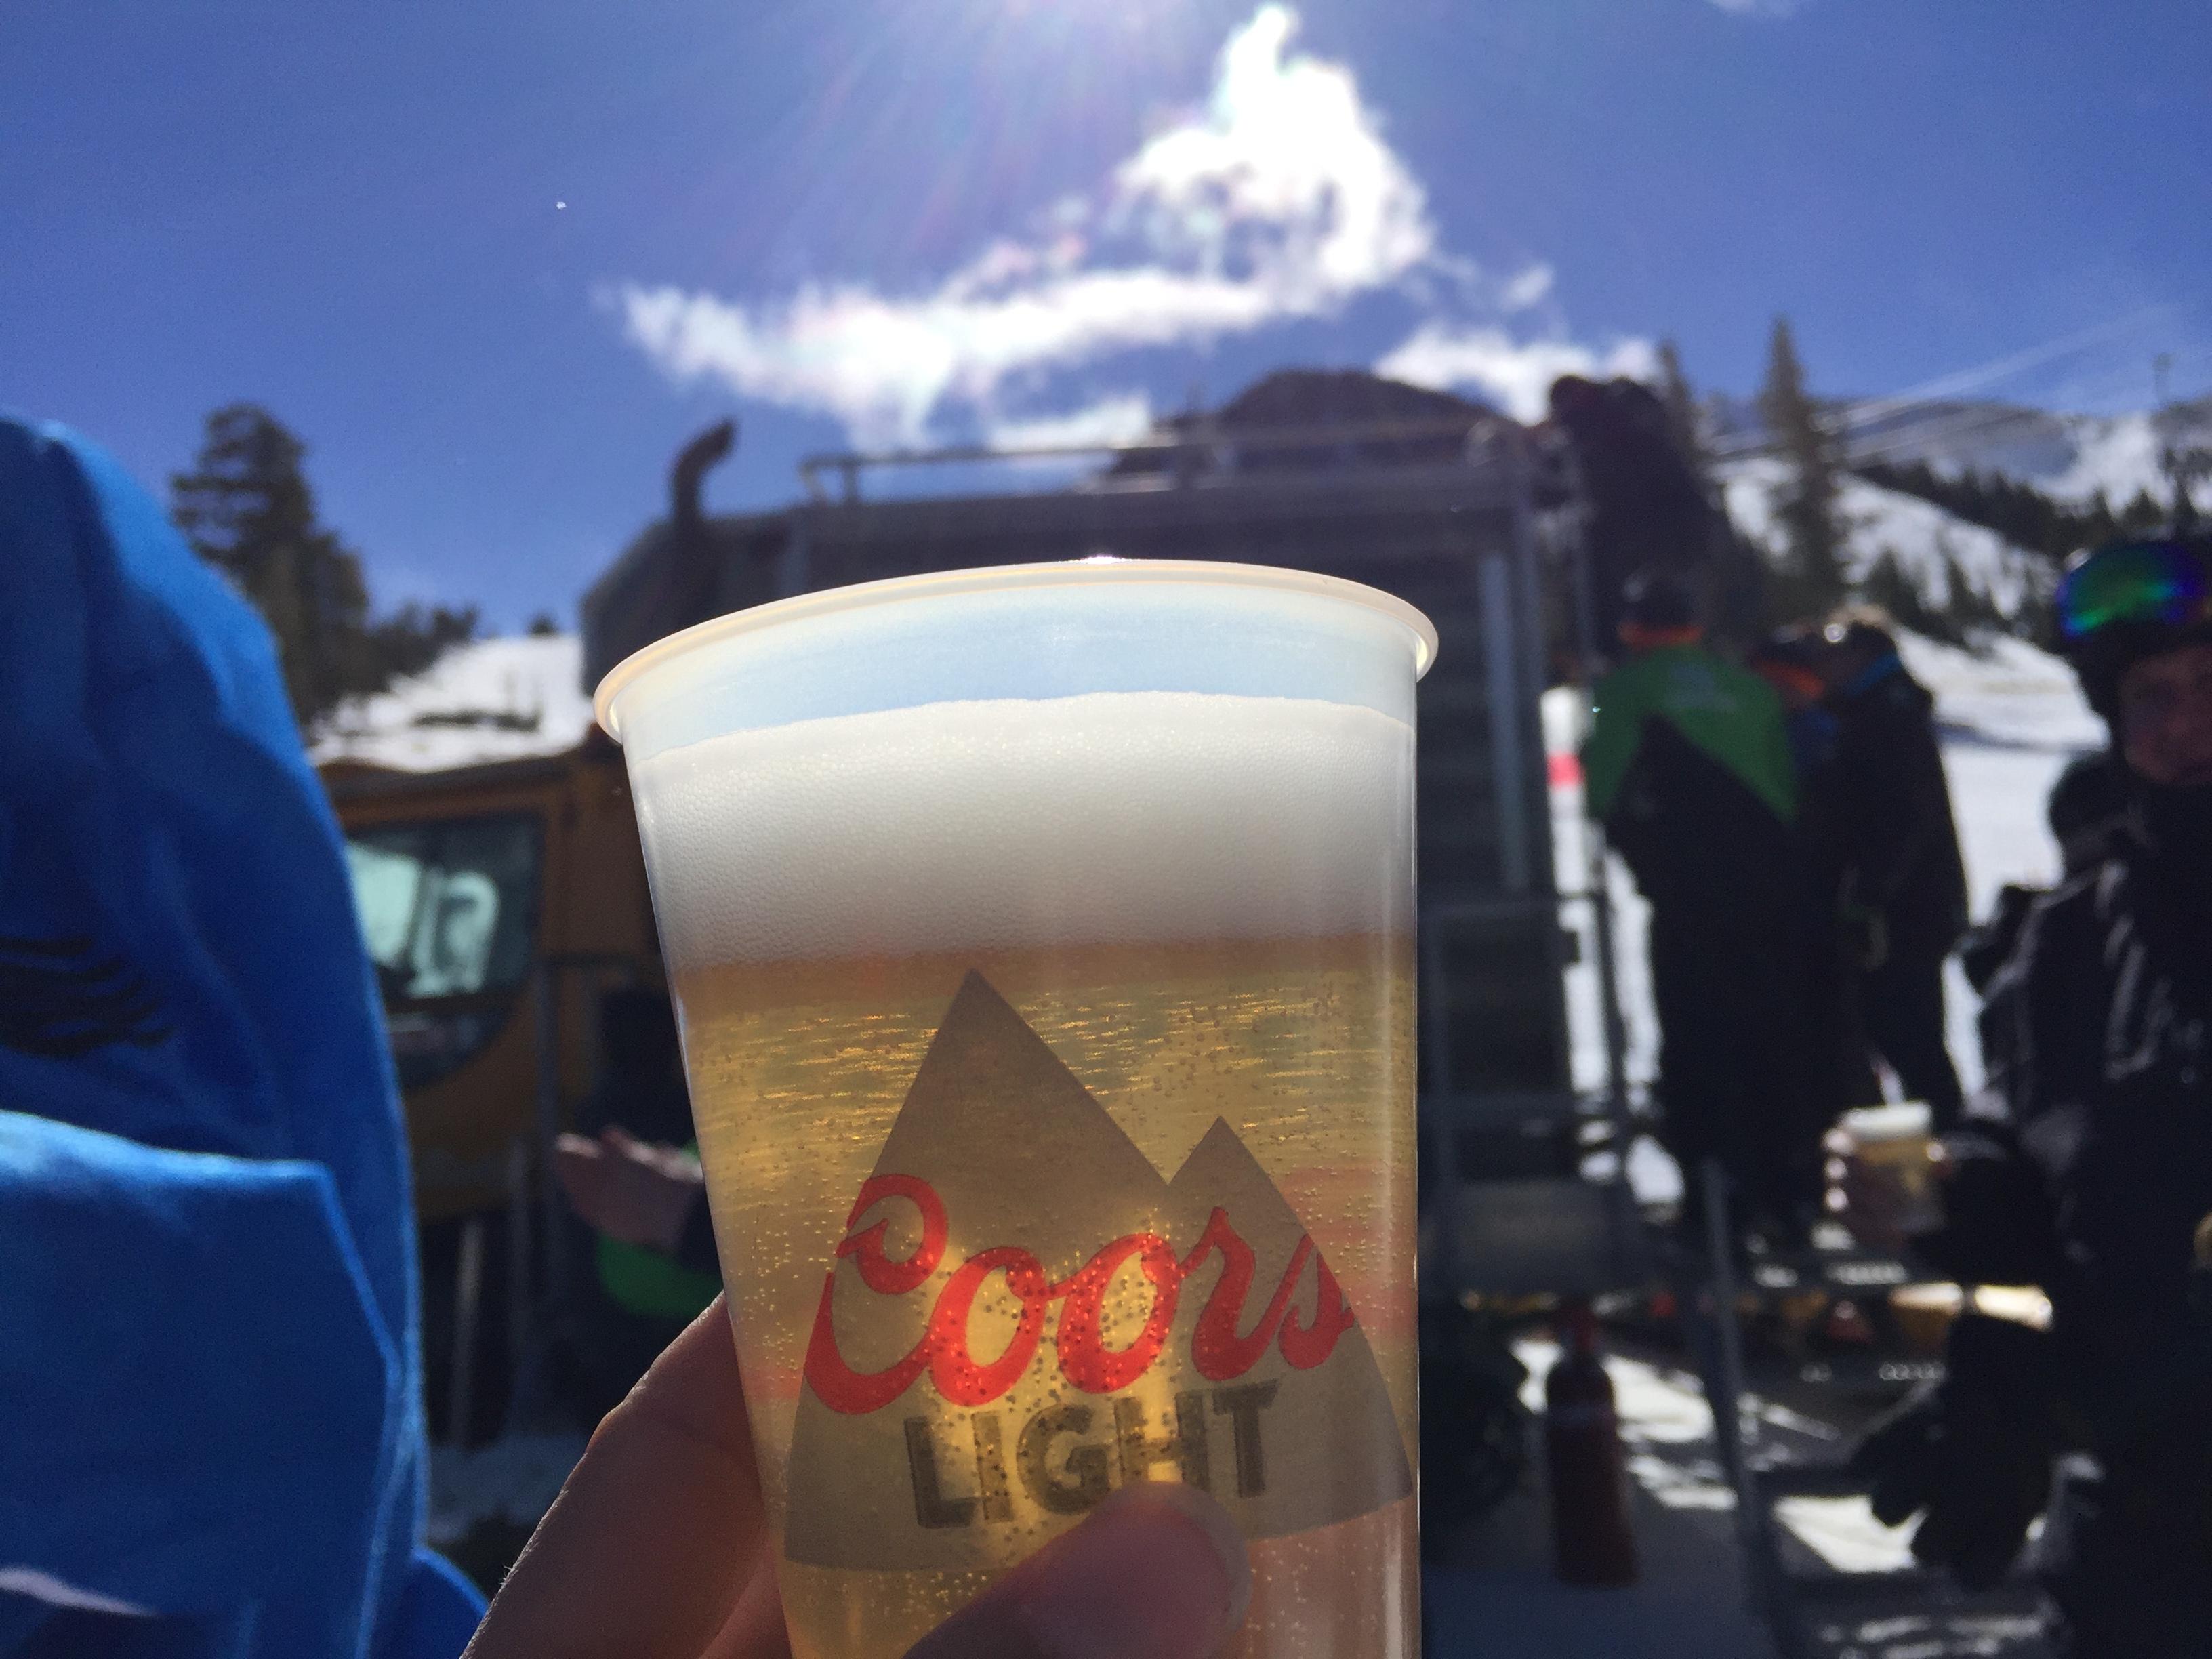 BeerToast